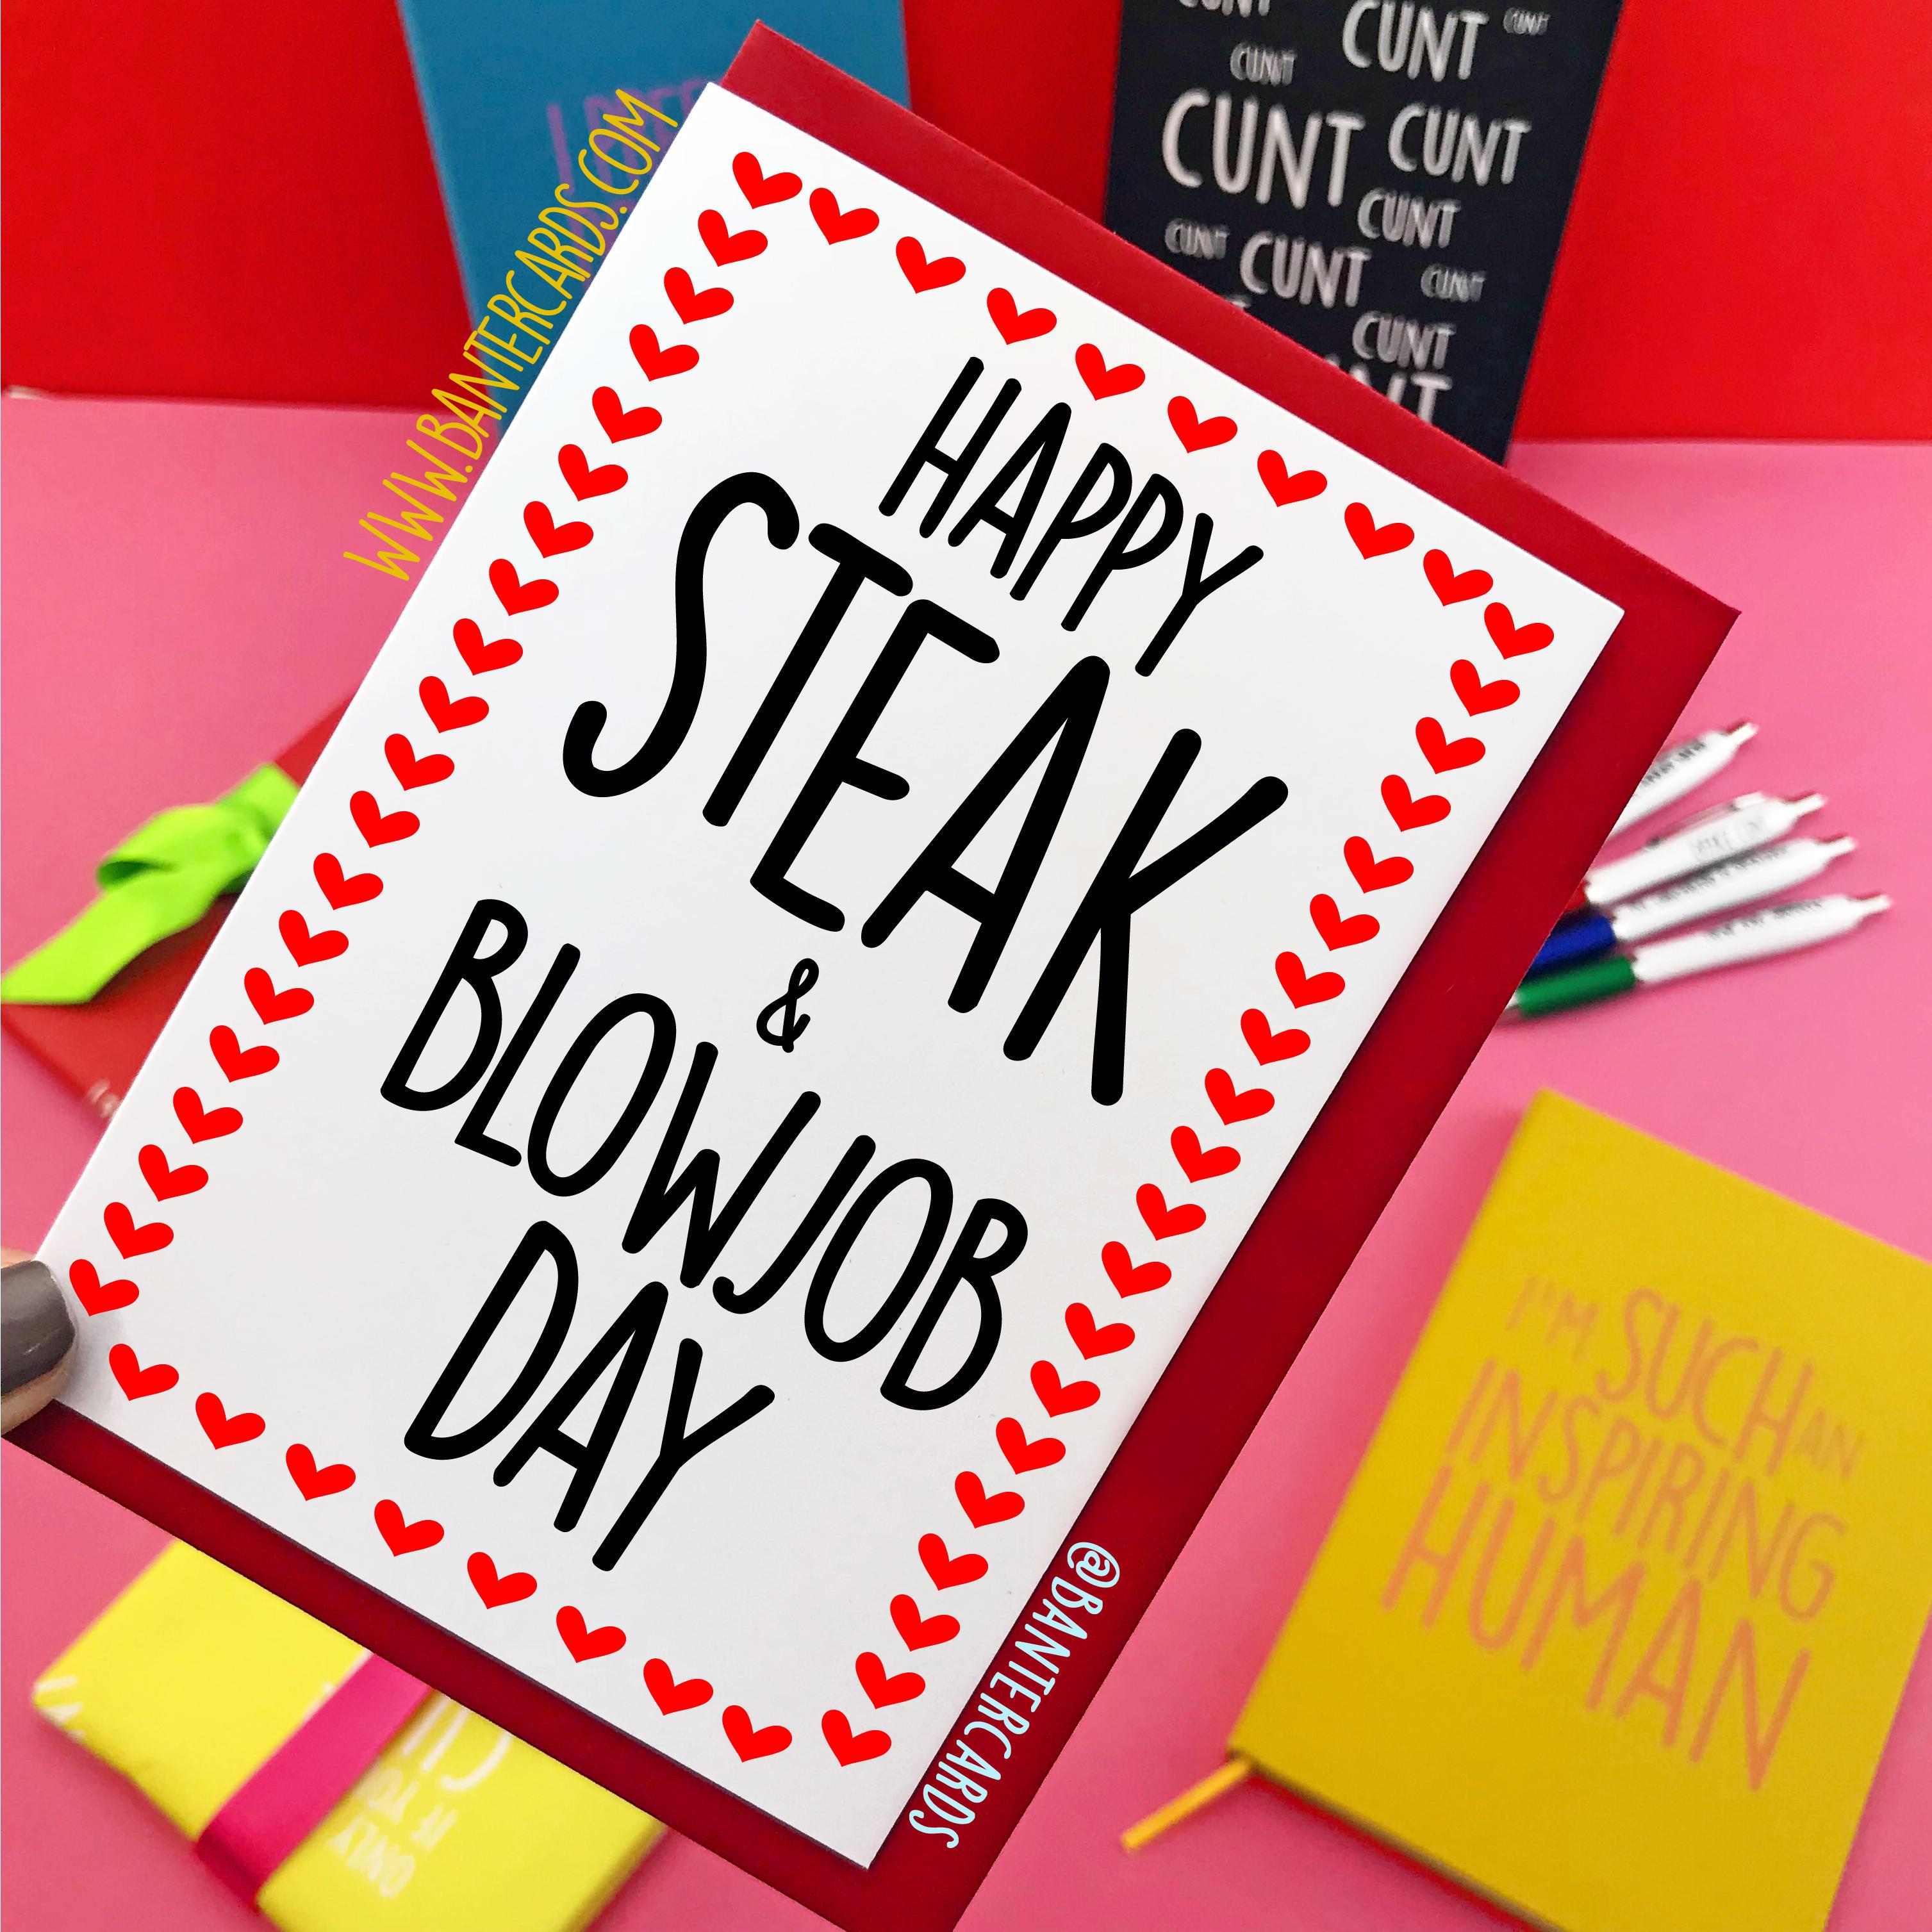 The steak blowjob online card amusing